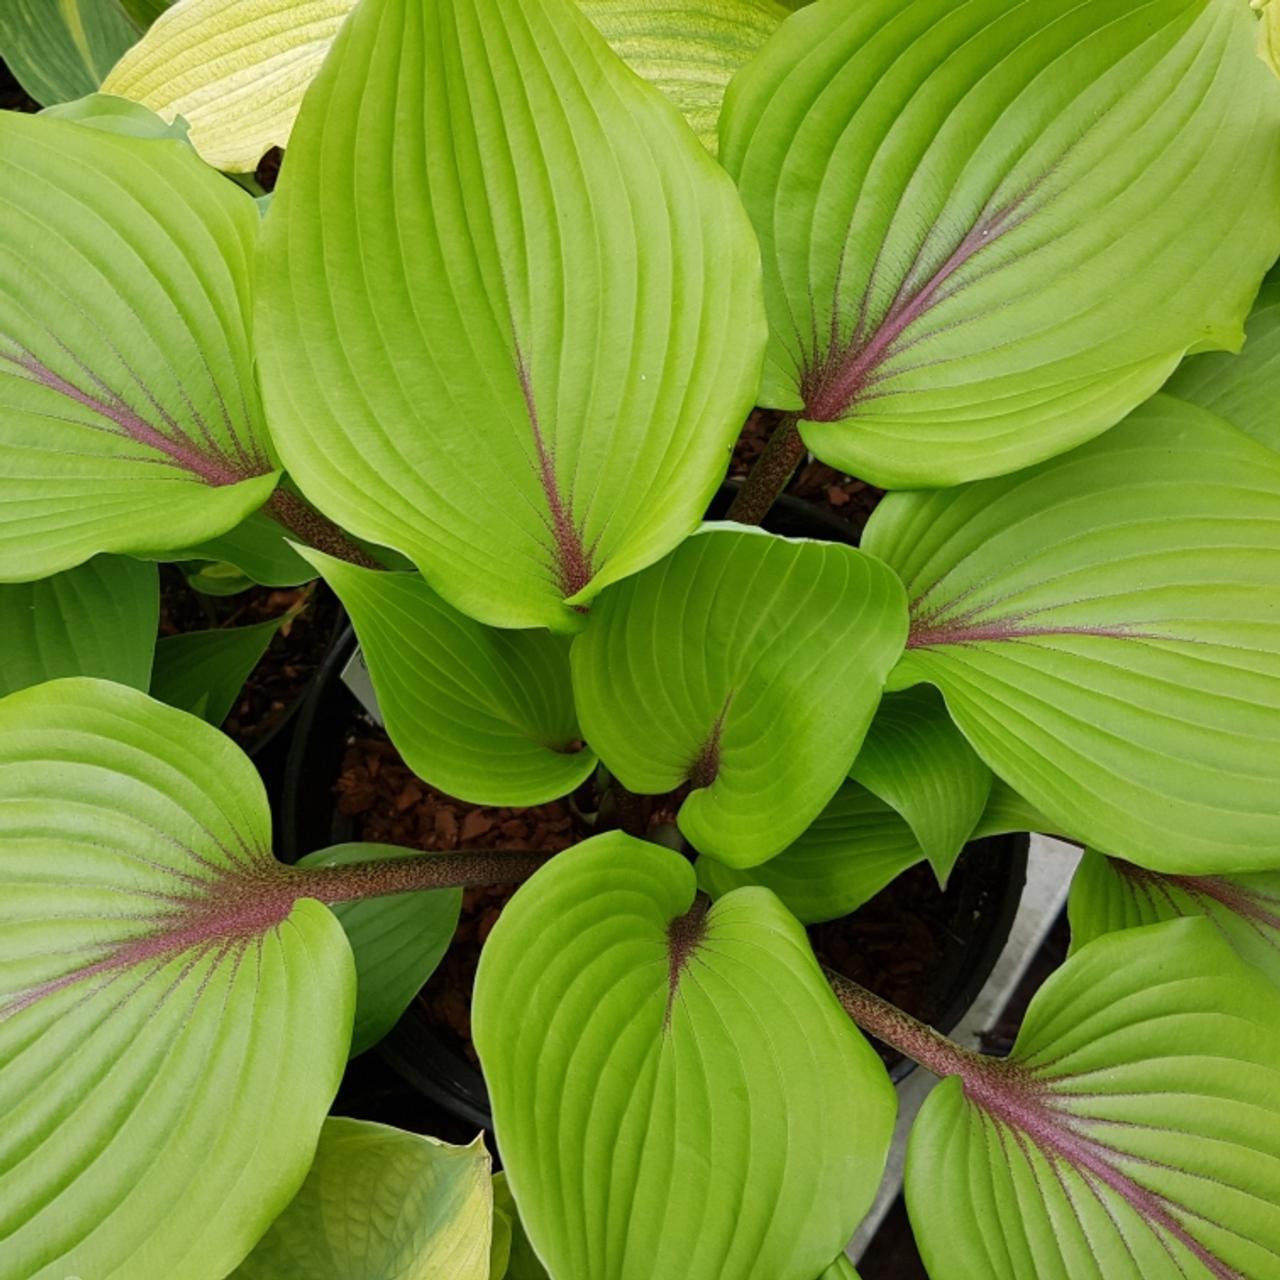 Hosta 'Almost' plant